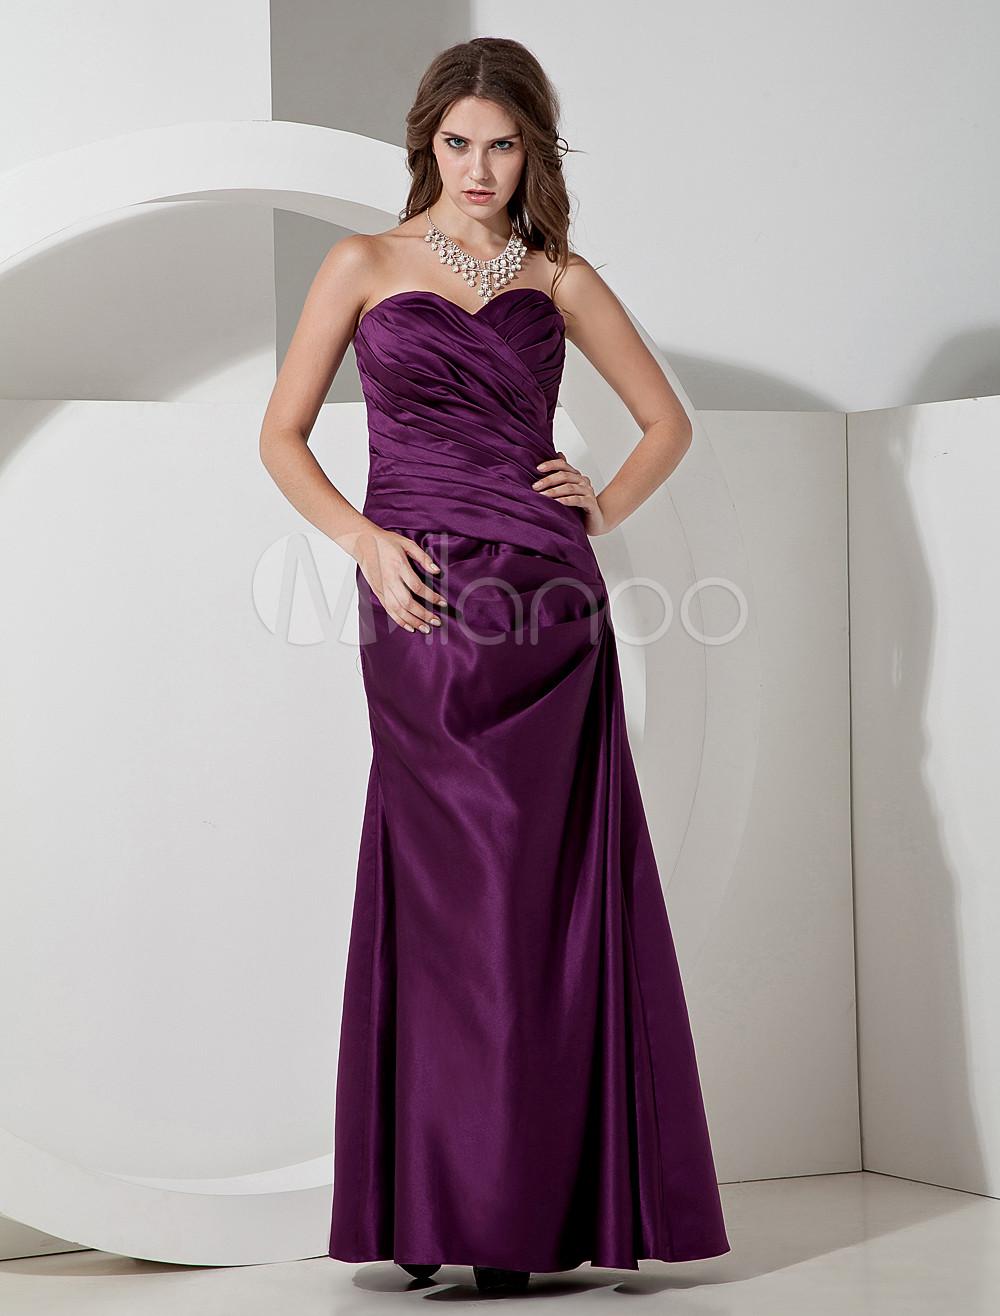 Elegant Grape Satin Sweetheart Floor Length Bridesmaid Dress